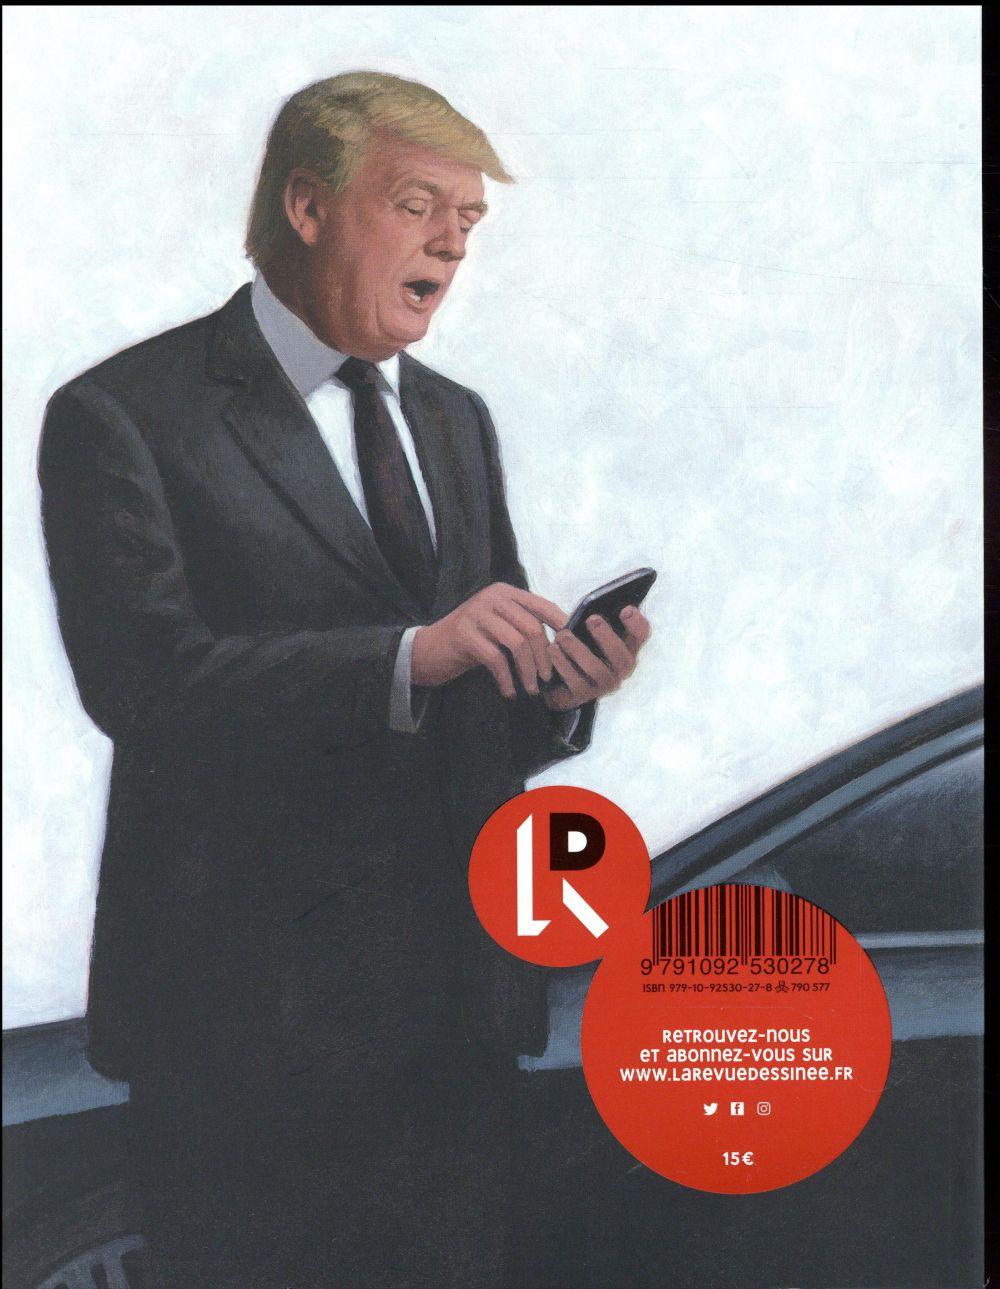 La revue dessinee n.17